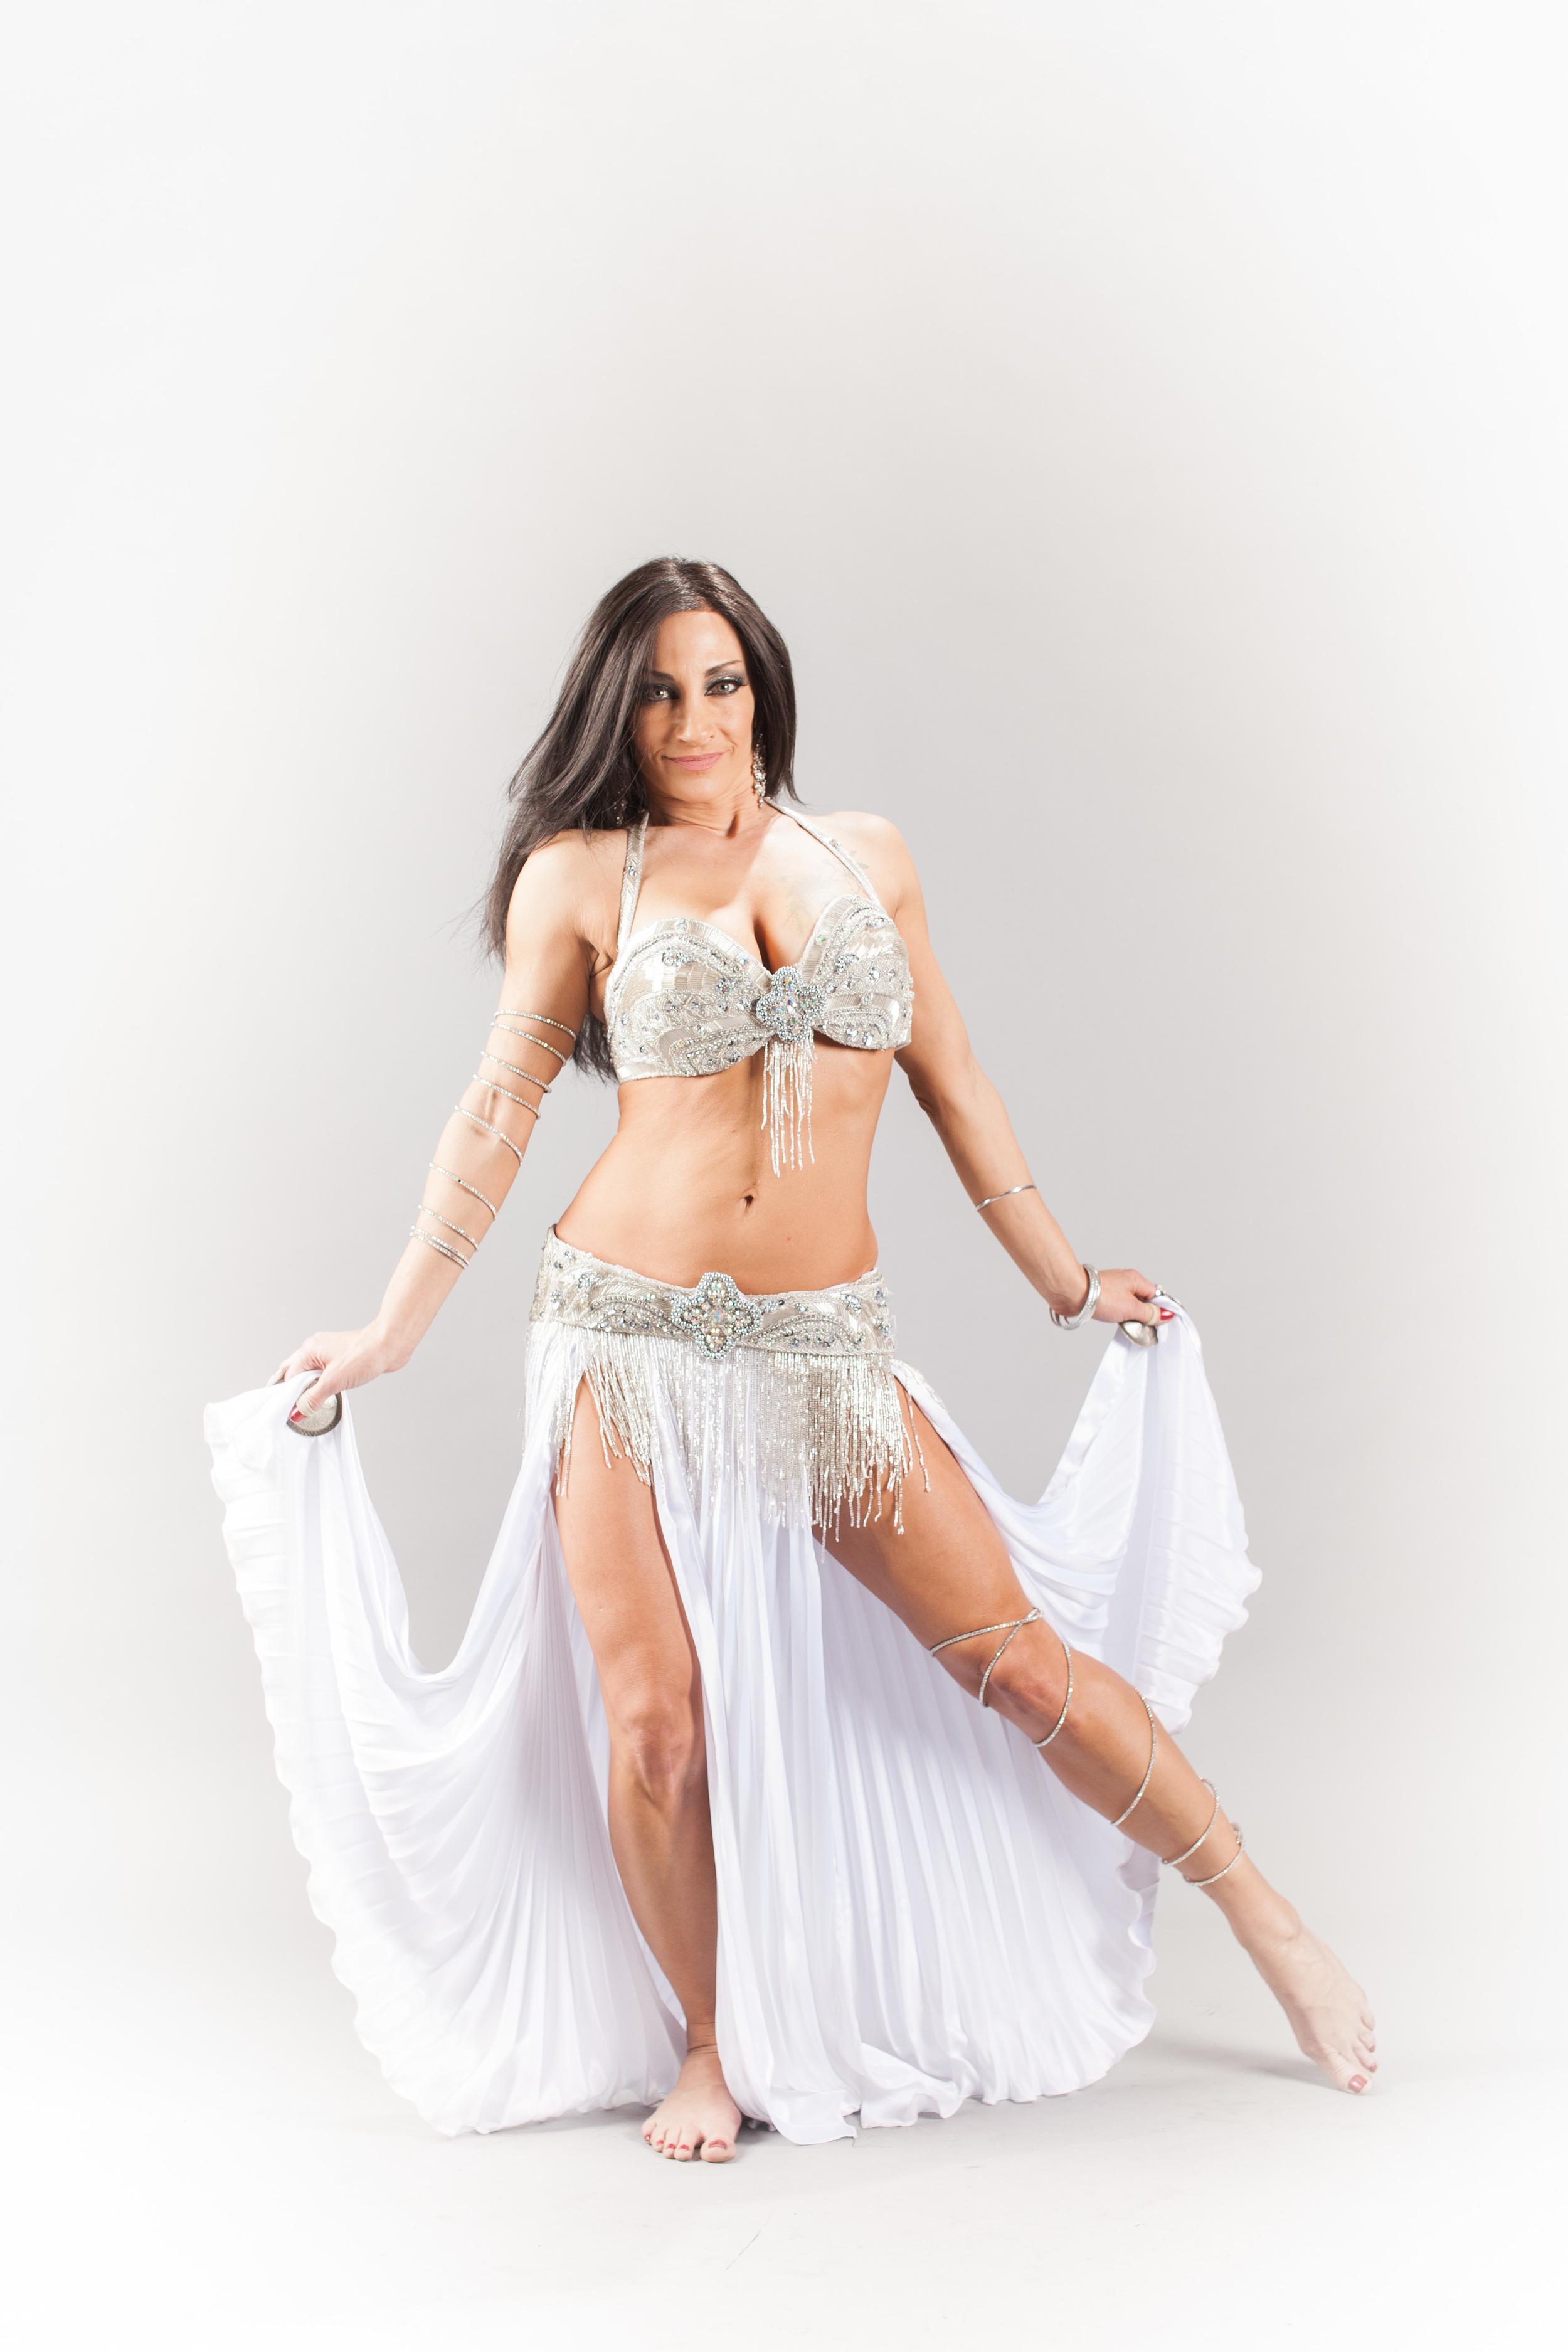 Mahsati Dancer unitymike photo (34 of 235).jpg